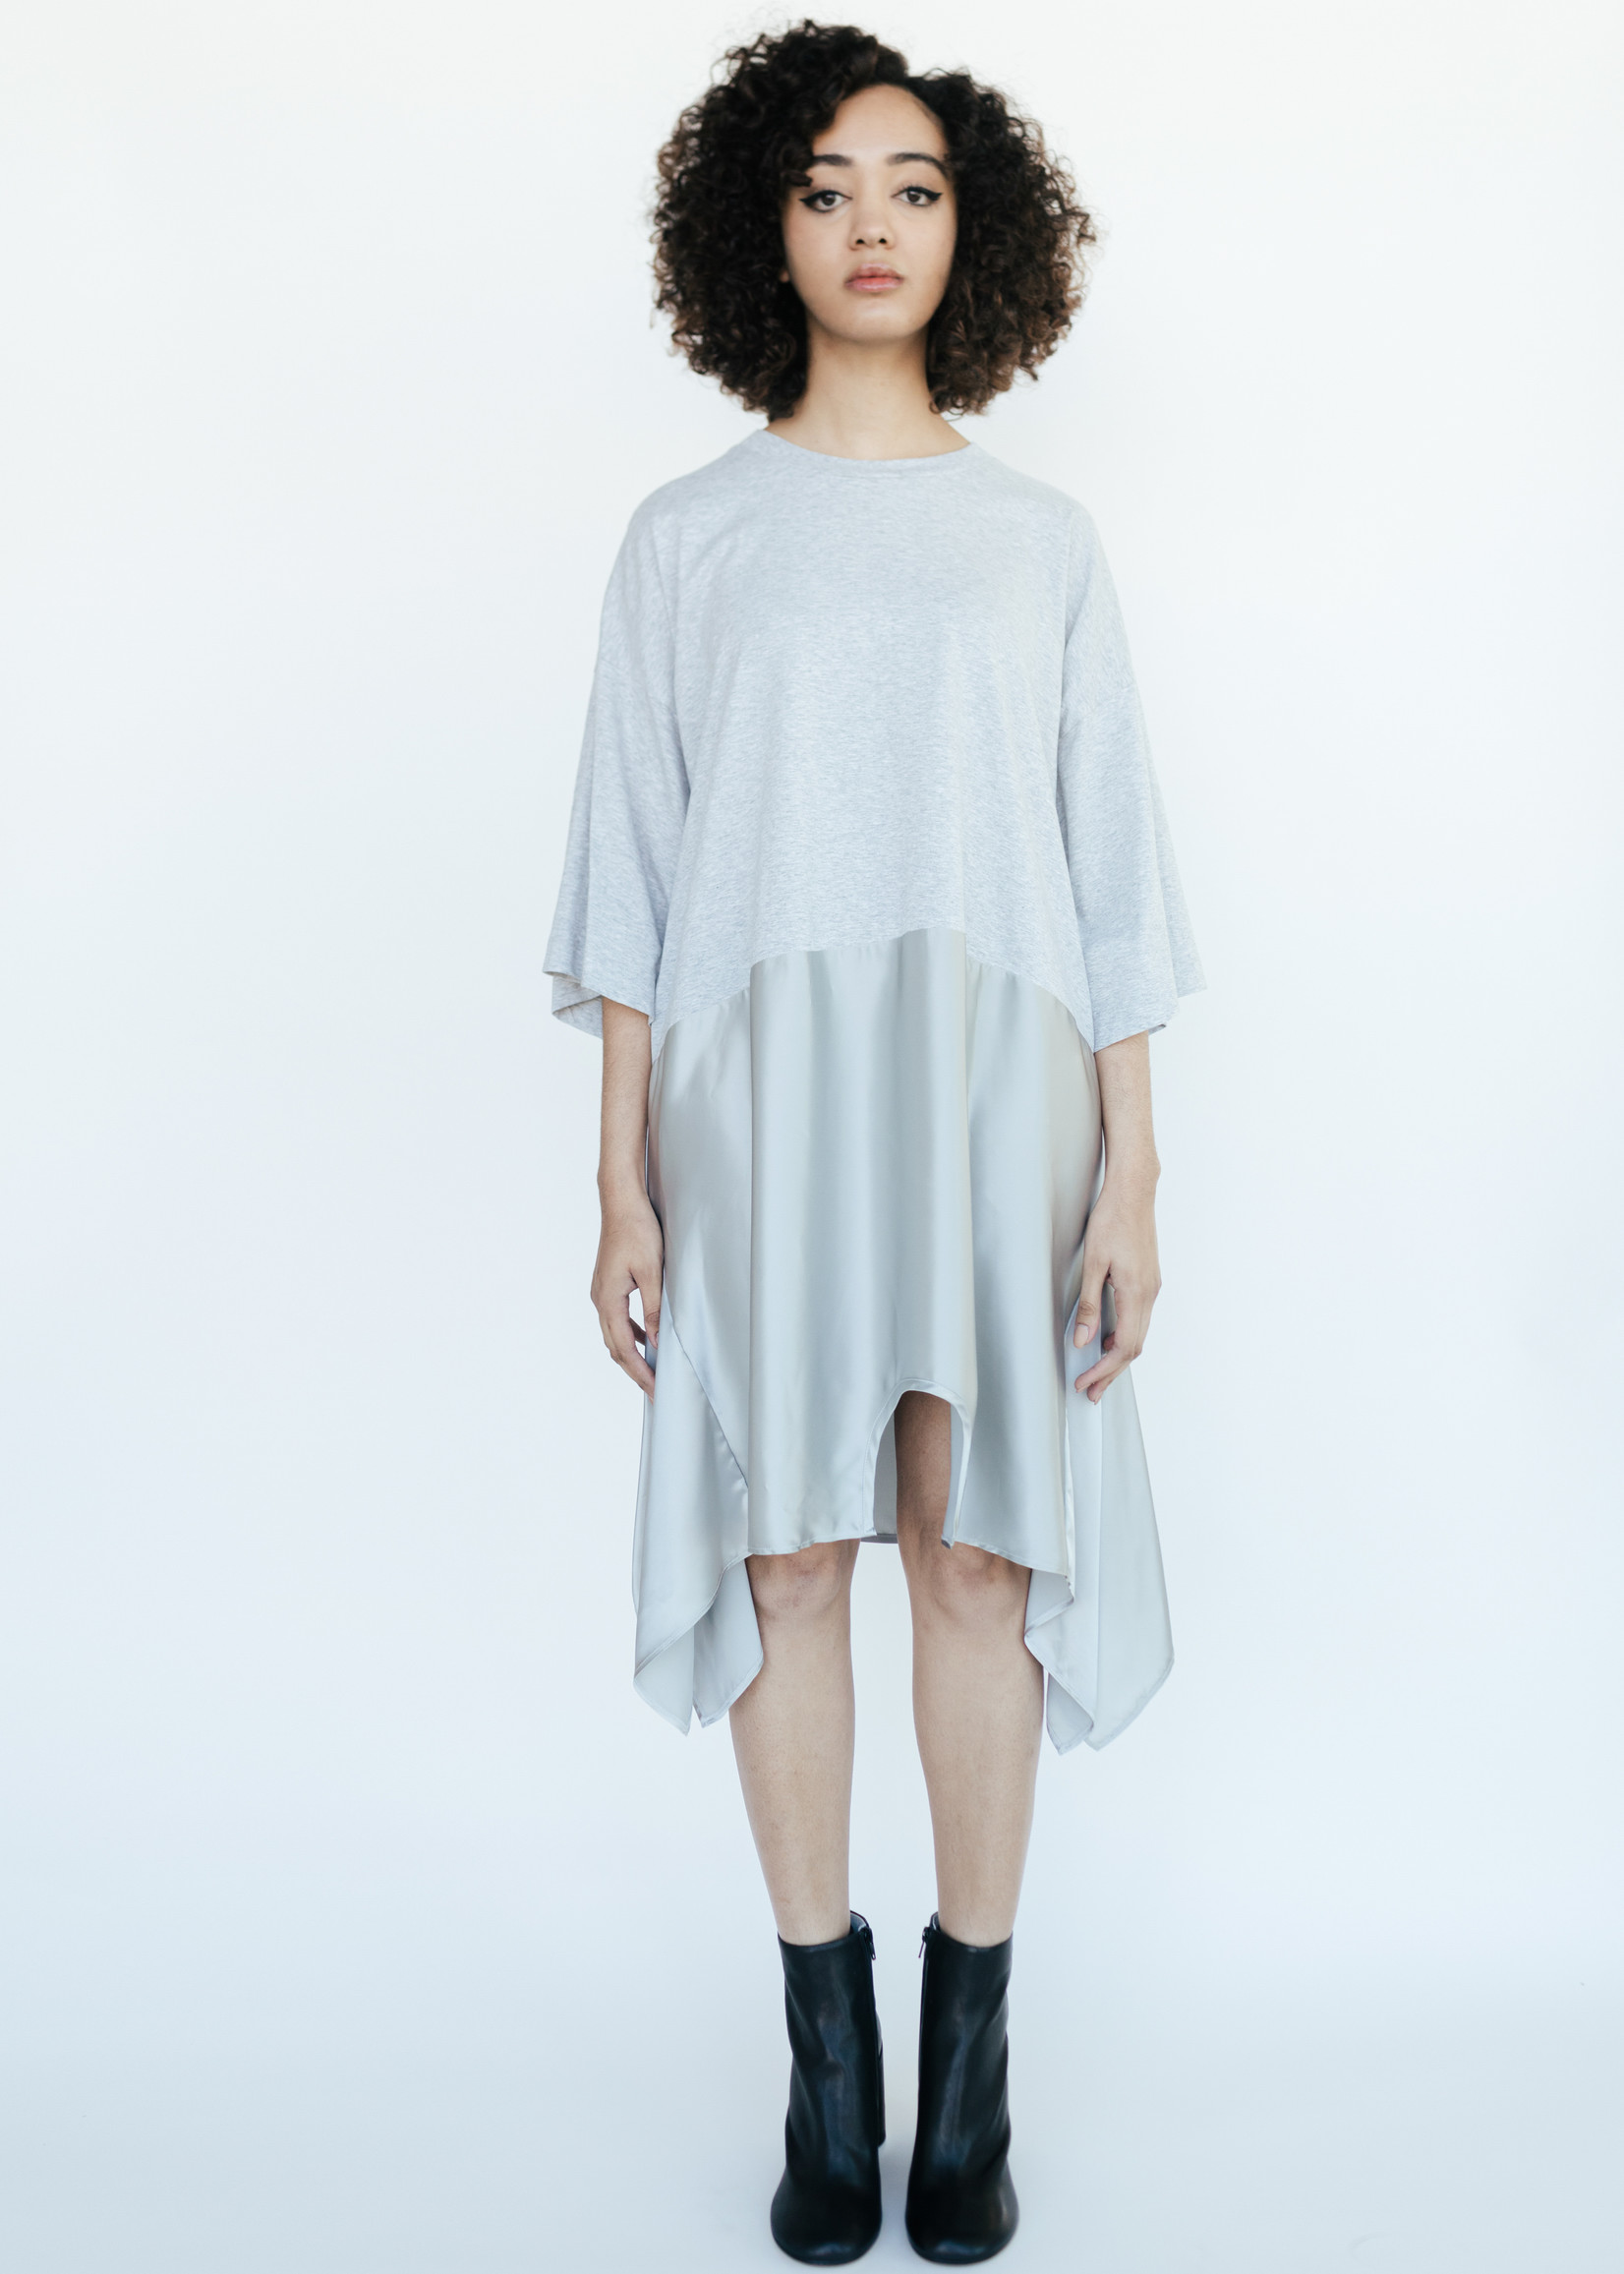 MM6 MAISON MARGIELA Oversized Mirror Image Dress in Grey